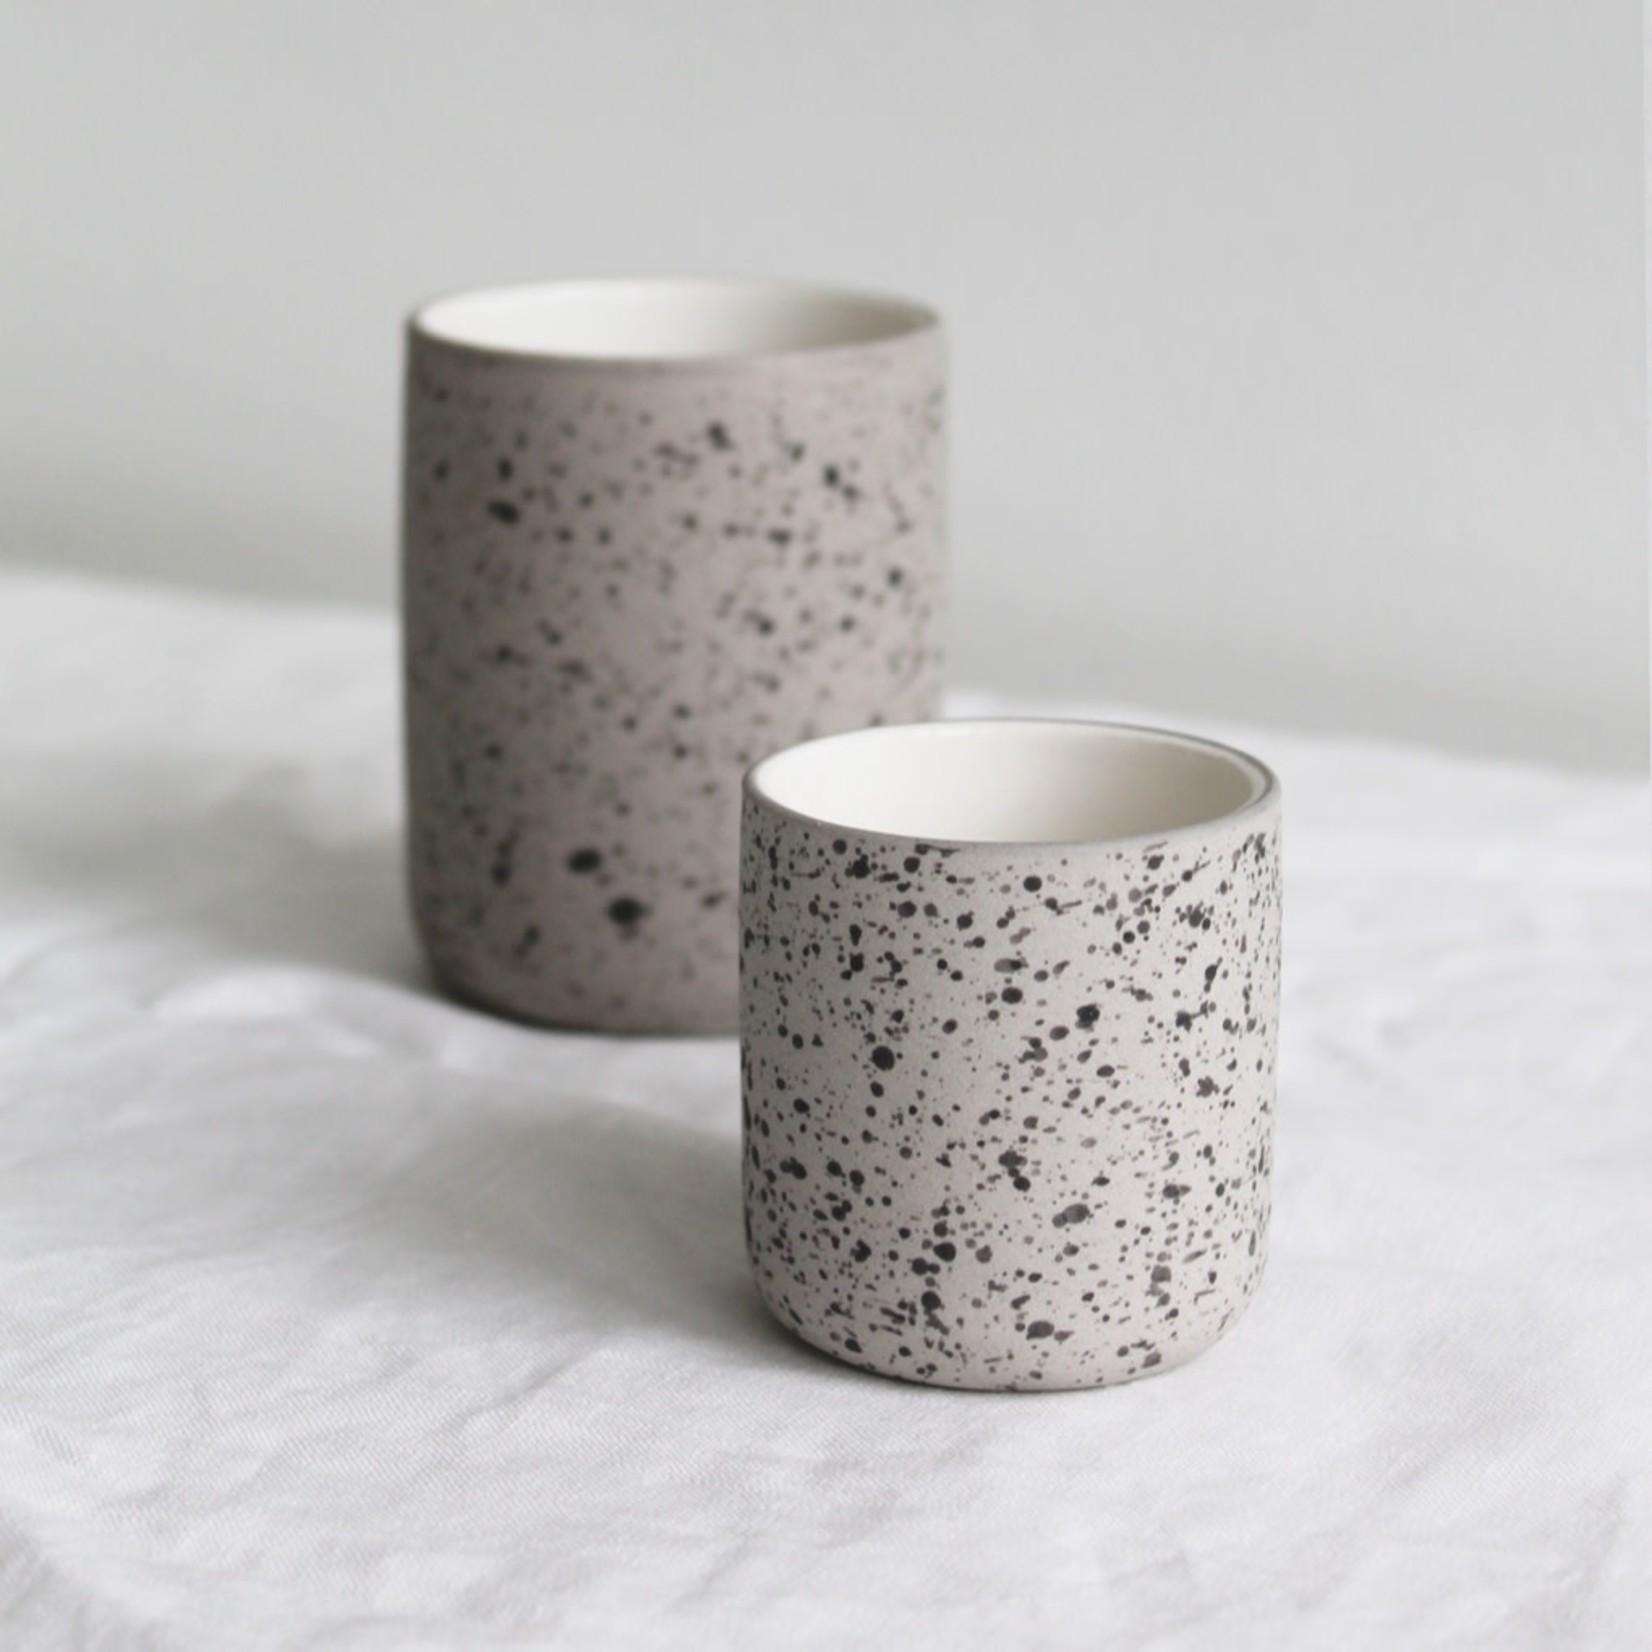 Archive Studio Archive Studio Handmade Espresso Cup Speckled